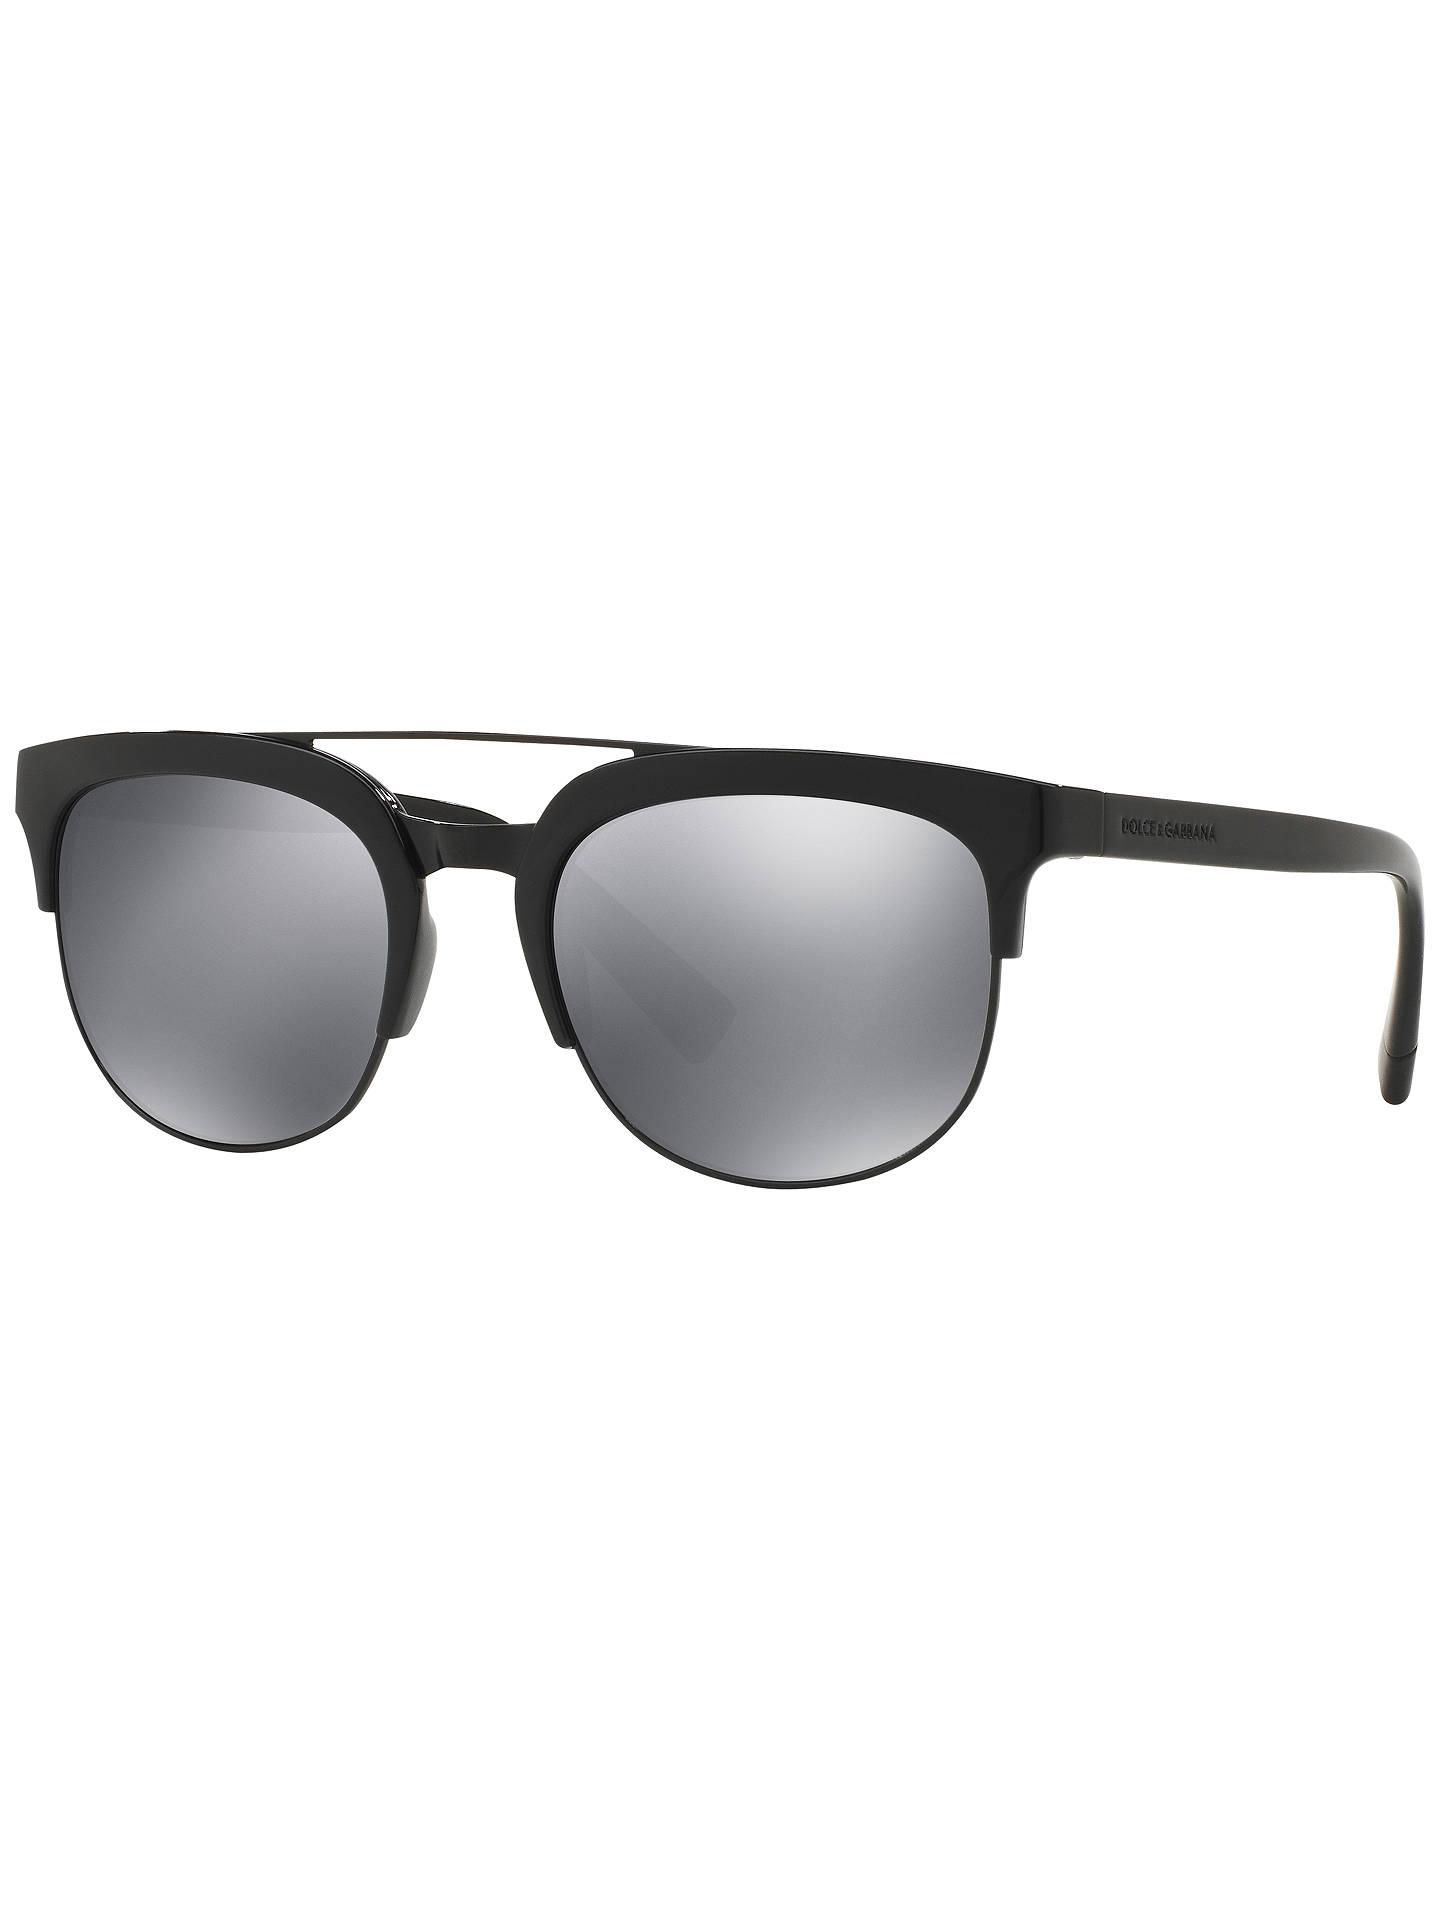 36f71915e9 BuyDolce   Gabbana DG6103 Round Sunglasses